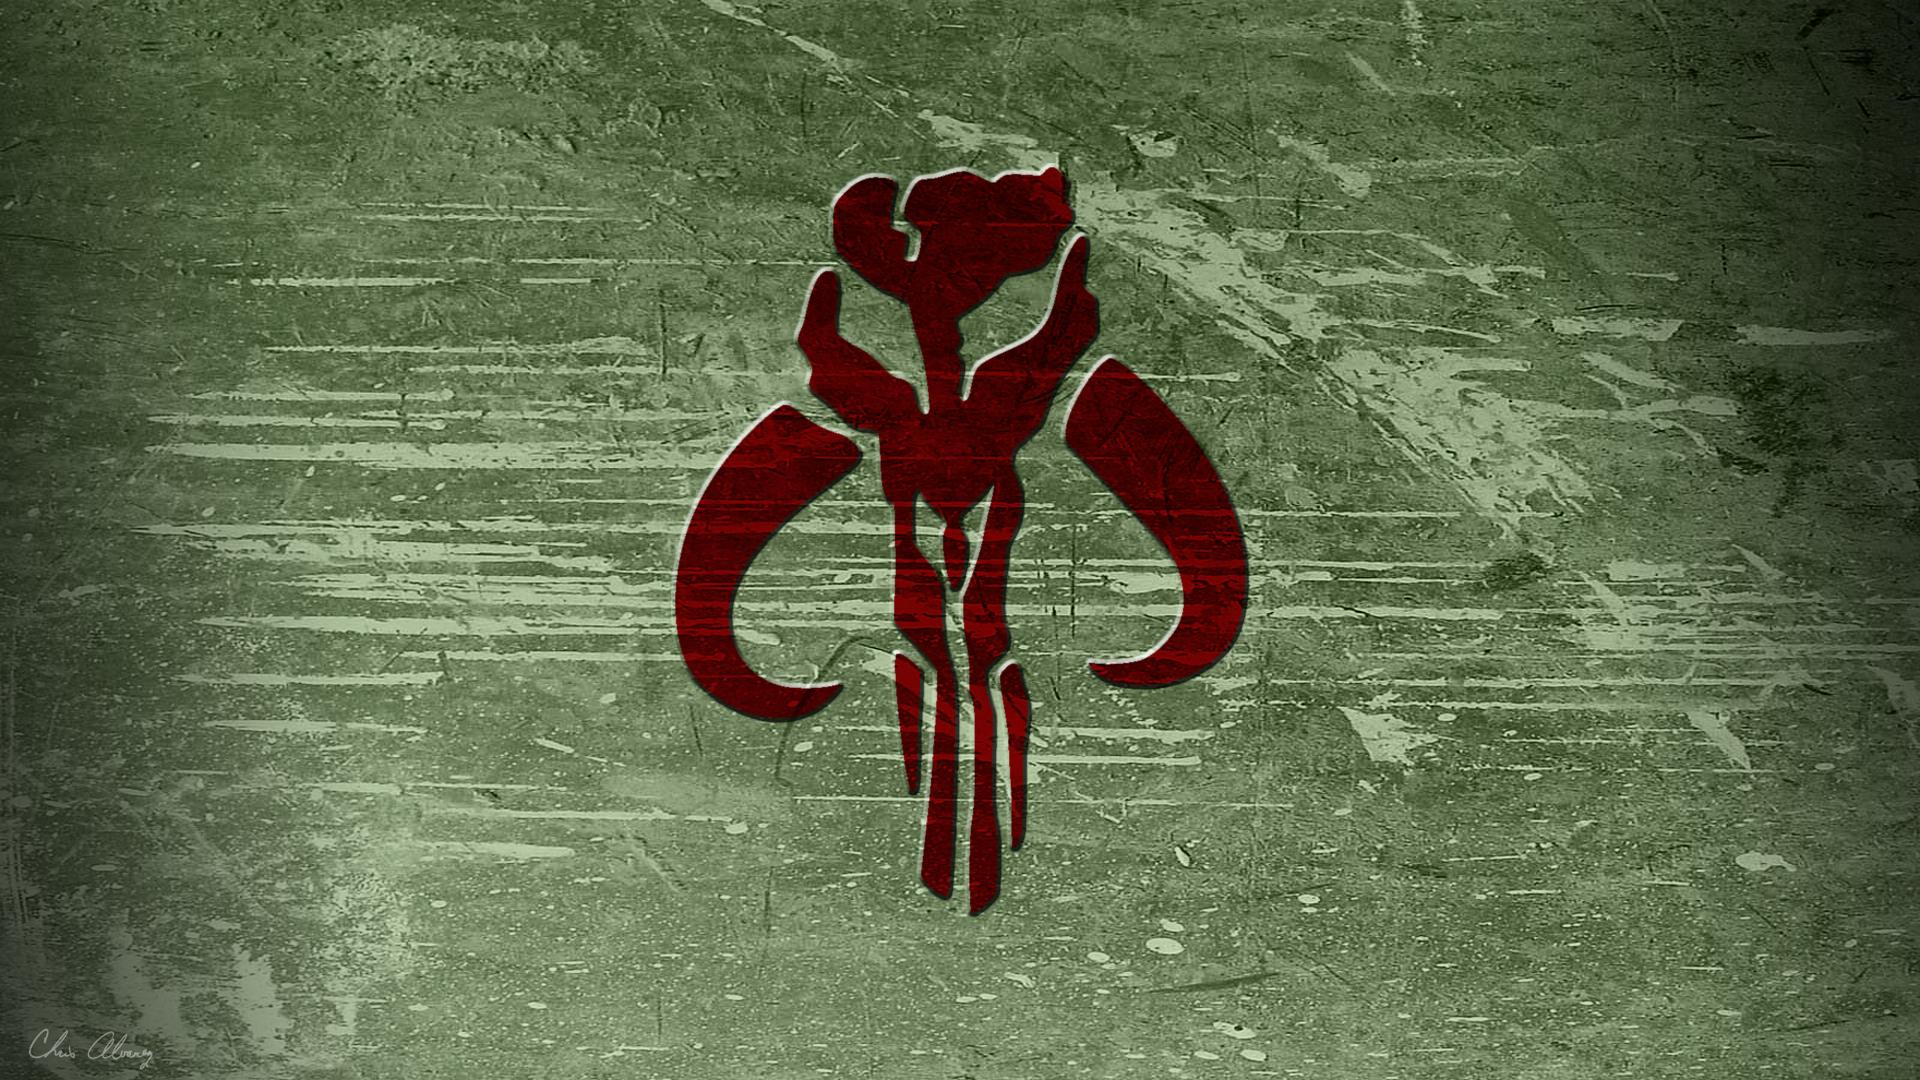 Mandalorian symbol on metal by chris alvarez on deviantart mandalorian symbol on metal by chris alvarez buycottarizona Image collections